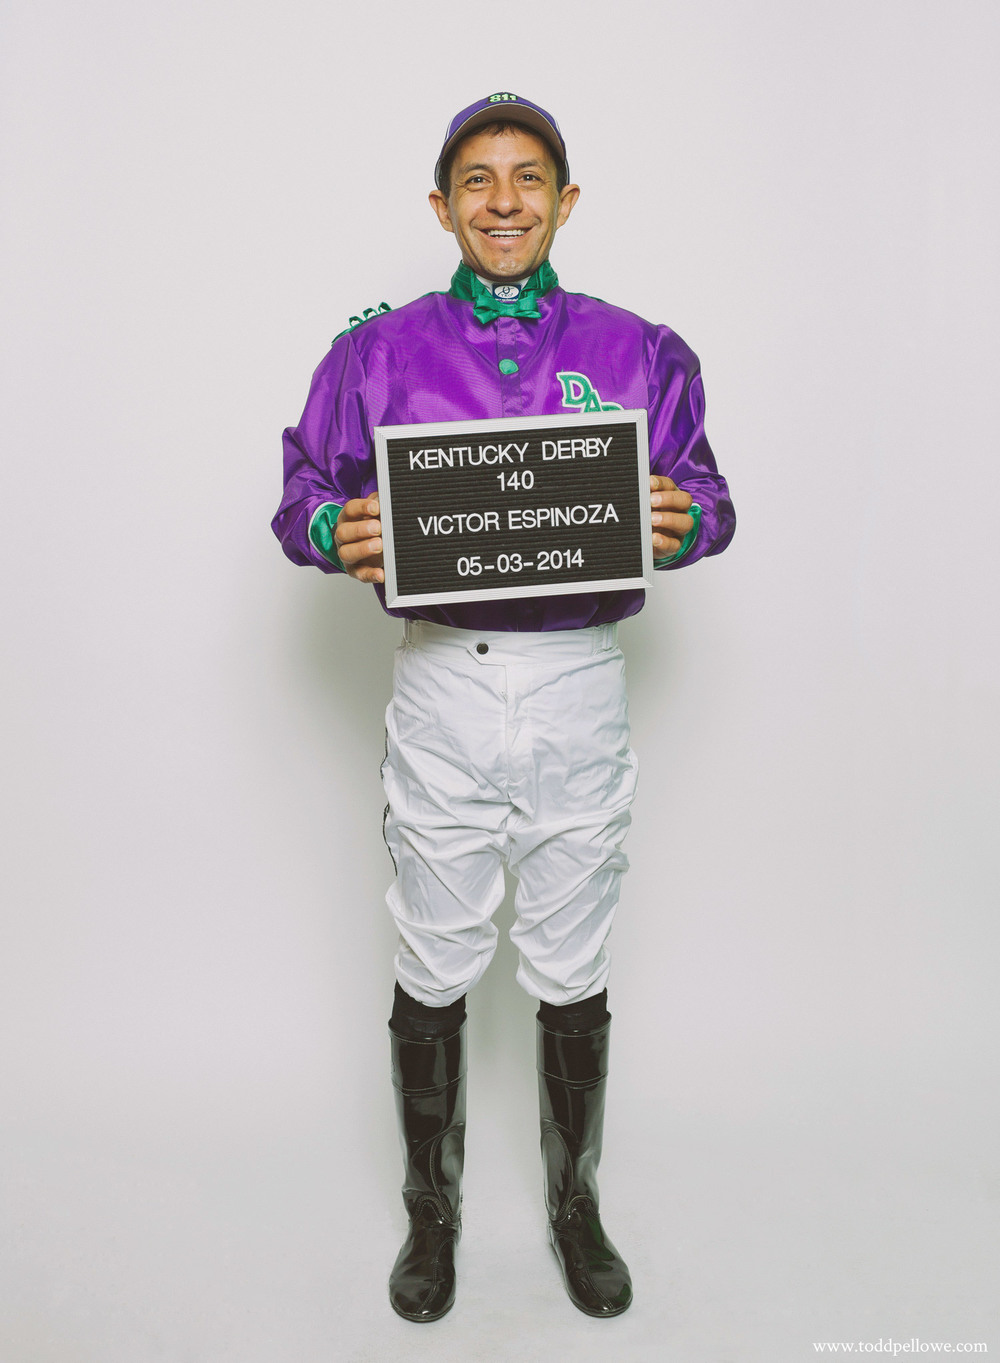 Victor Espinoza, Kentucky Derby 140 Winner